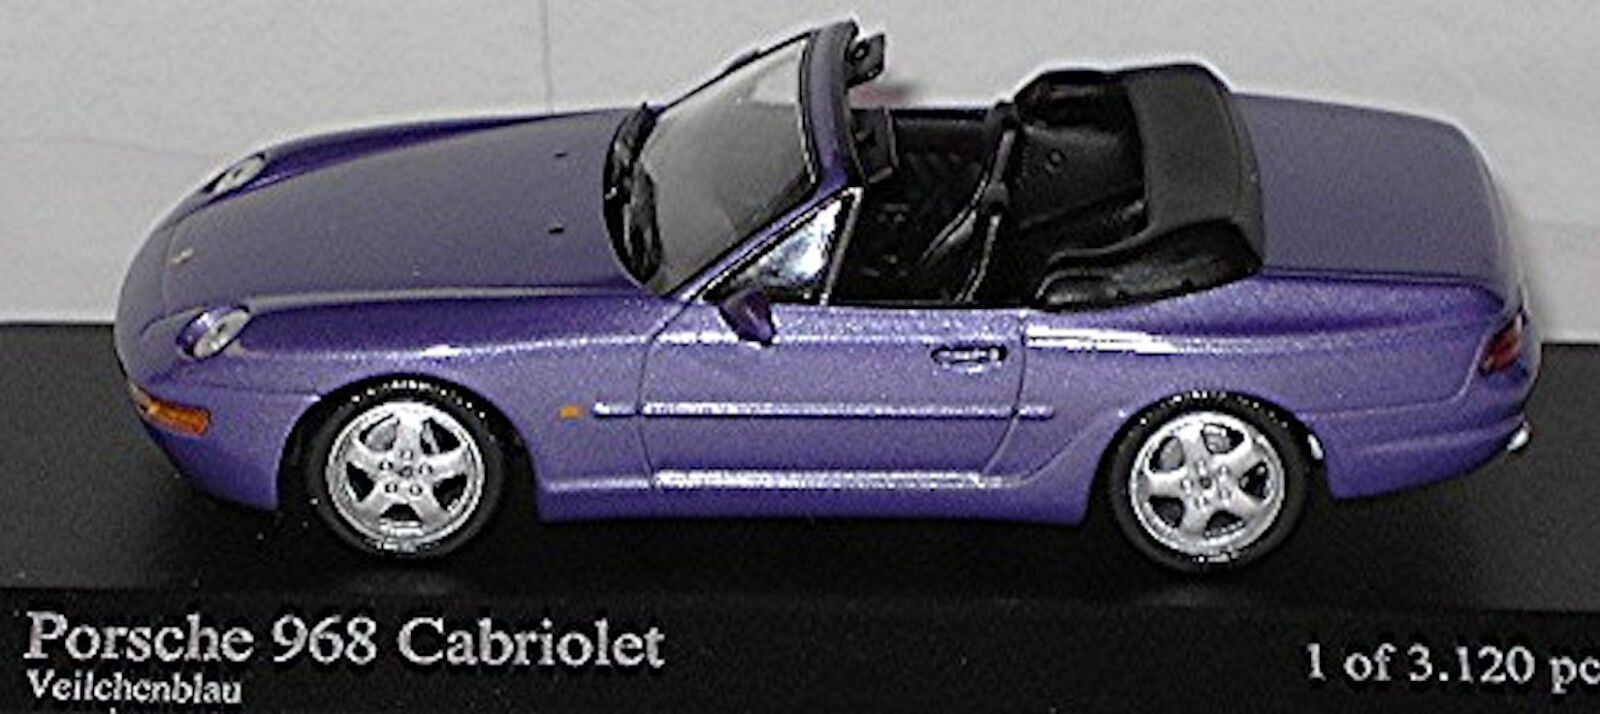 Porsche 968 Converdeible 1991-95 púrpuraa Púrpura Púrpura Púrpura Metálico 1 43 Minichamps 710dcb